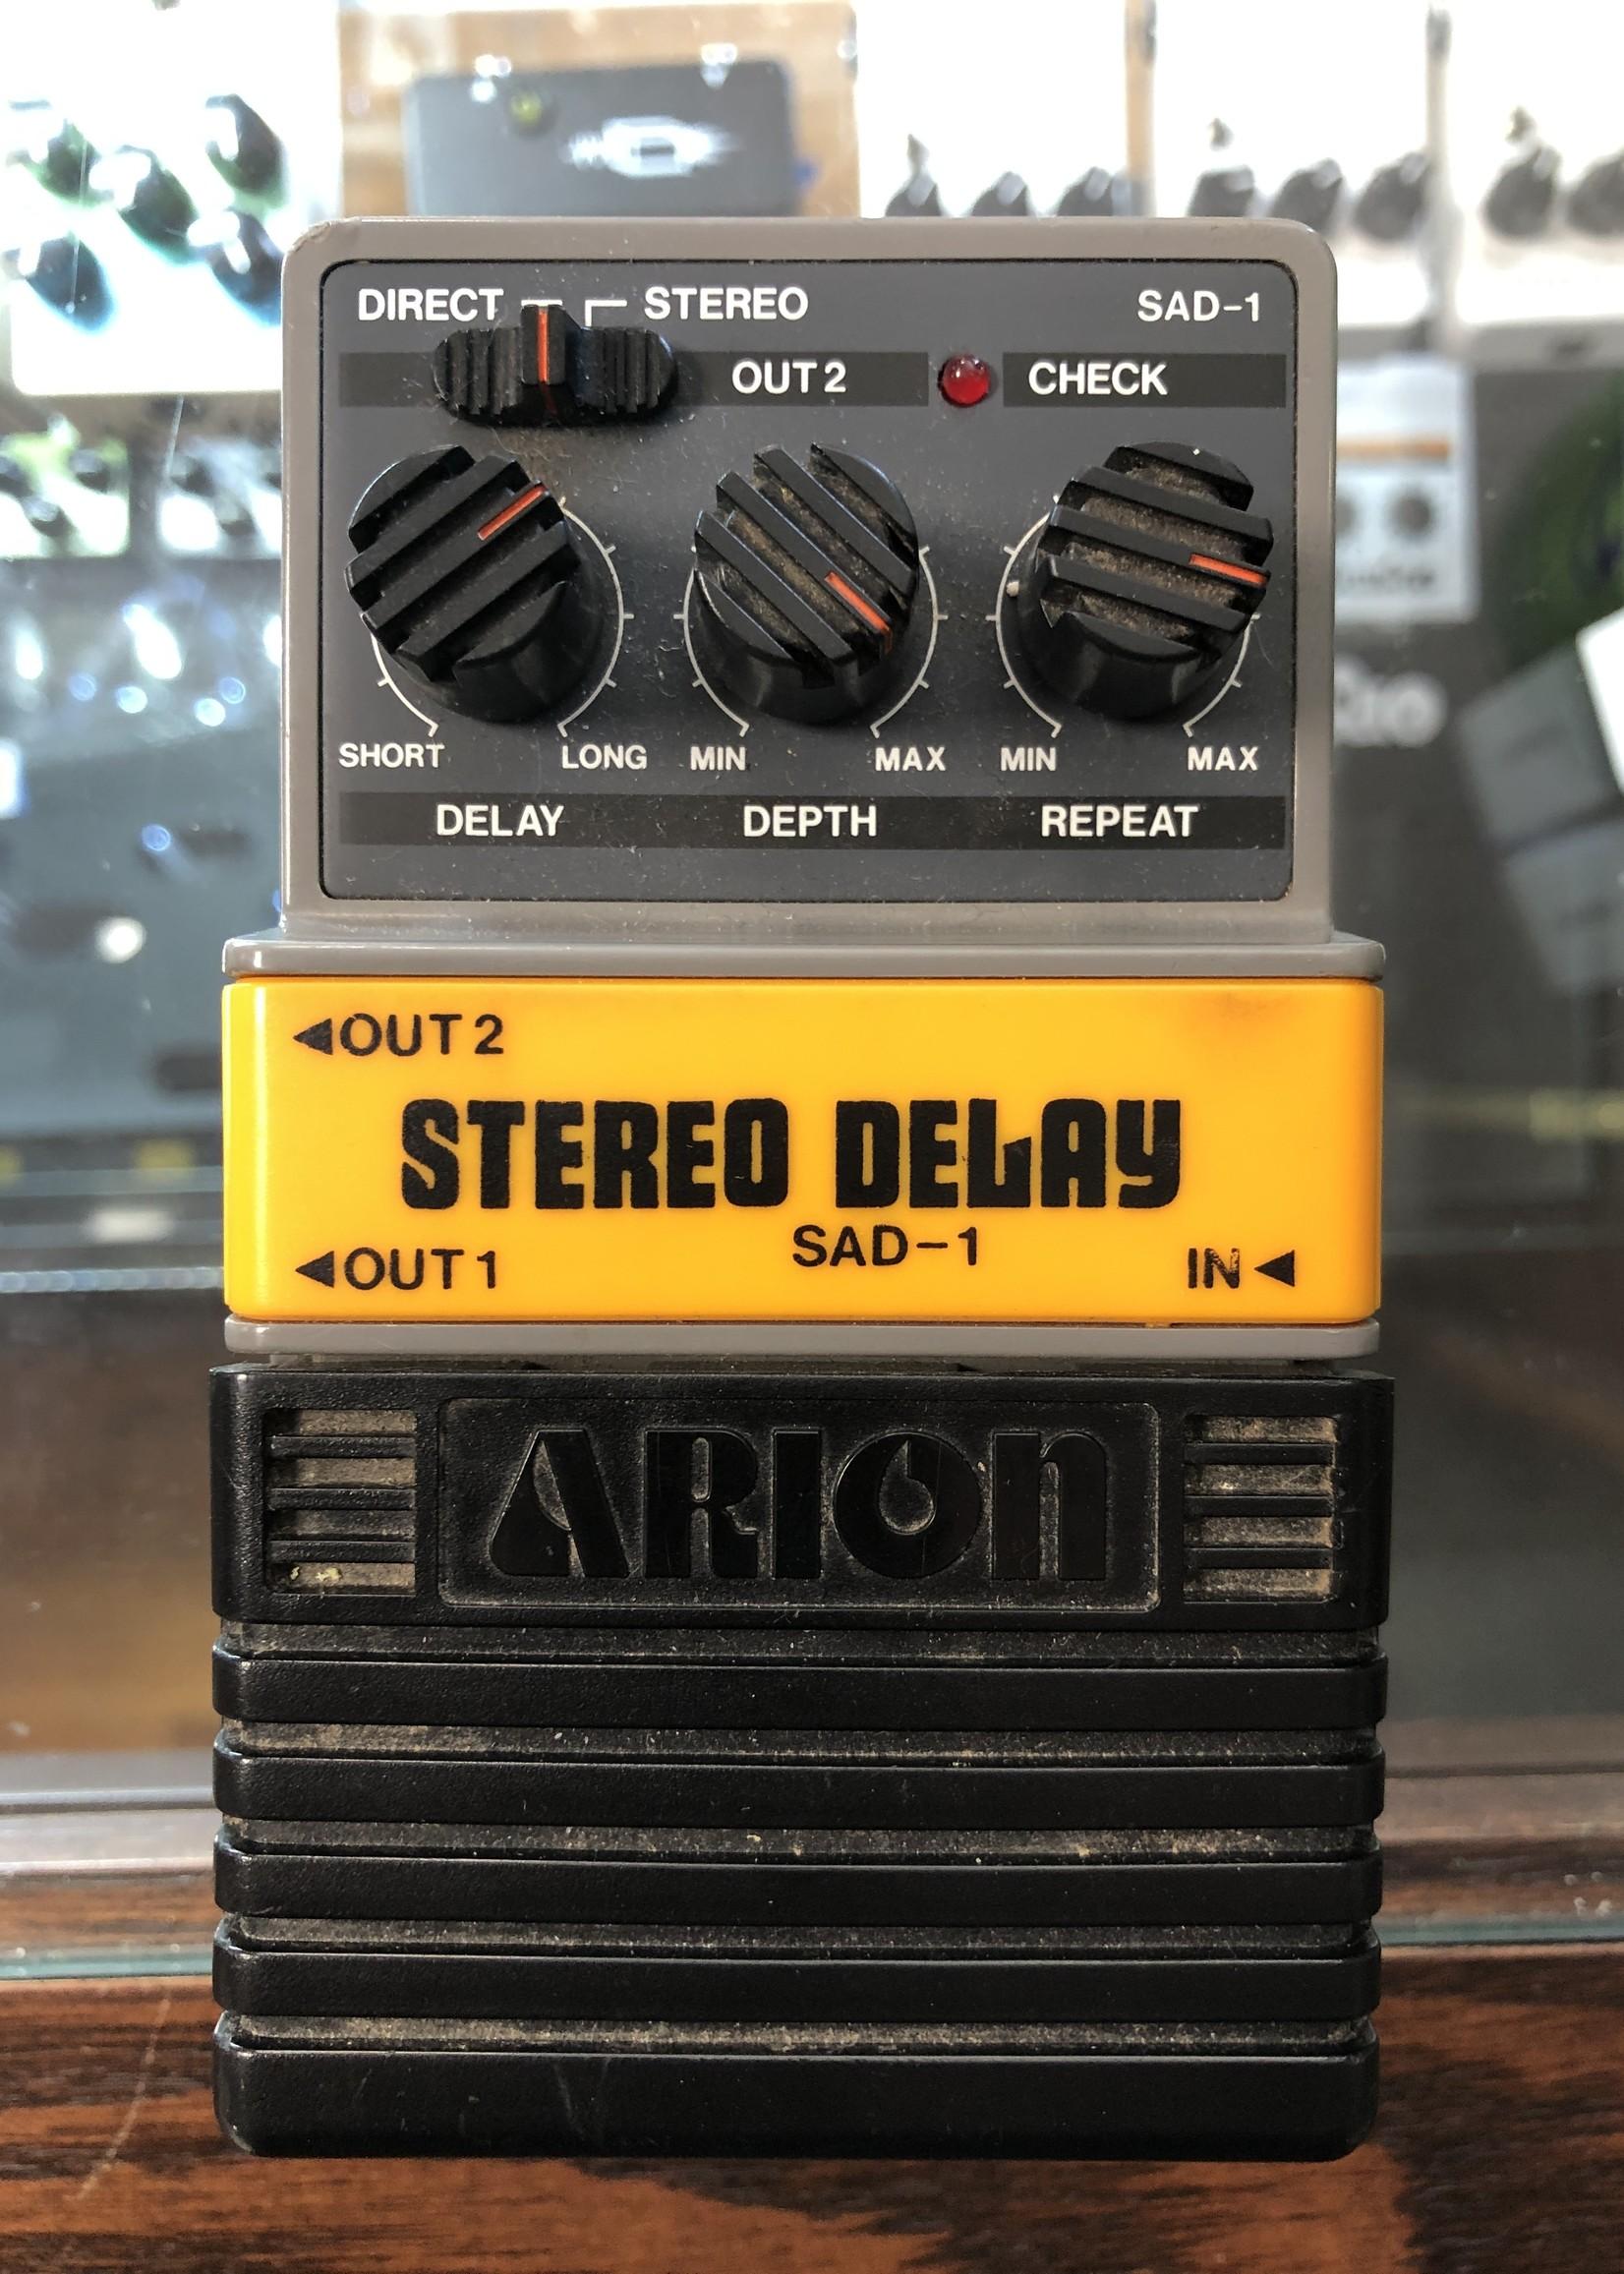 Arion SAD-1 stereo delay (con) SW